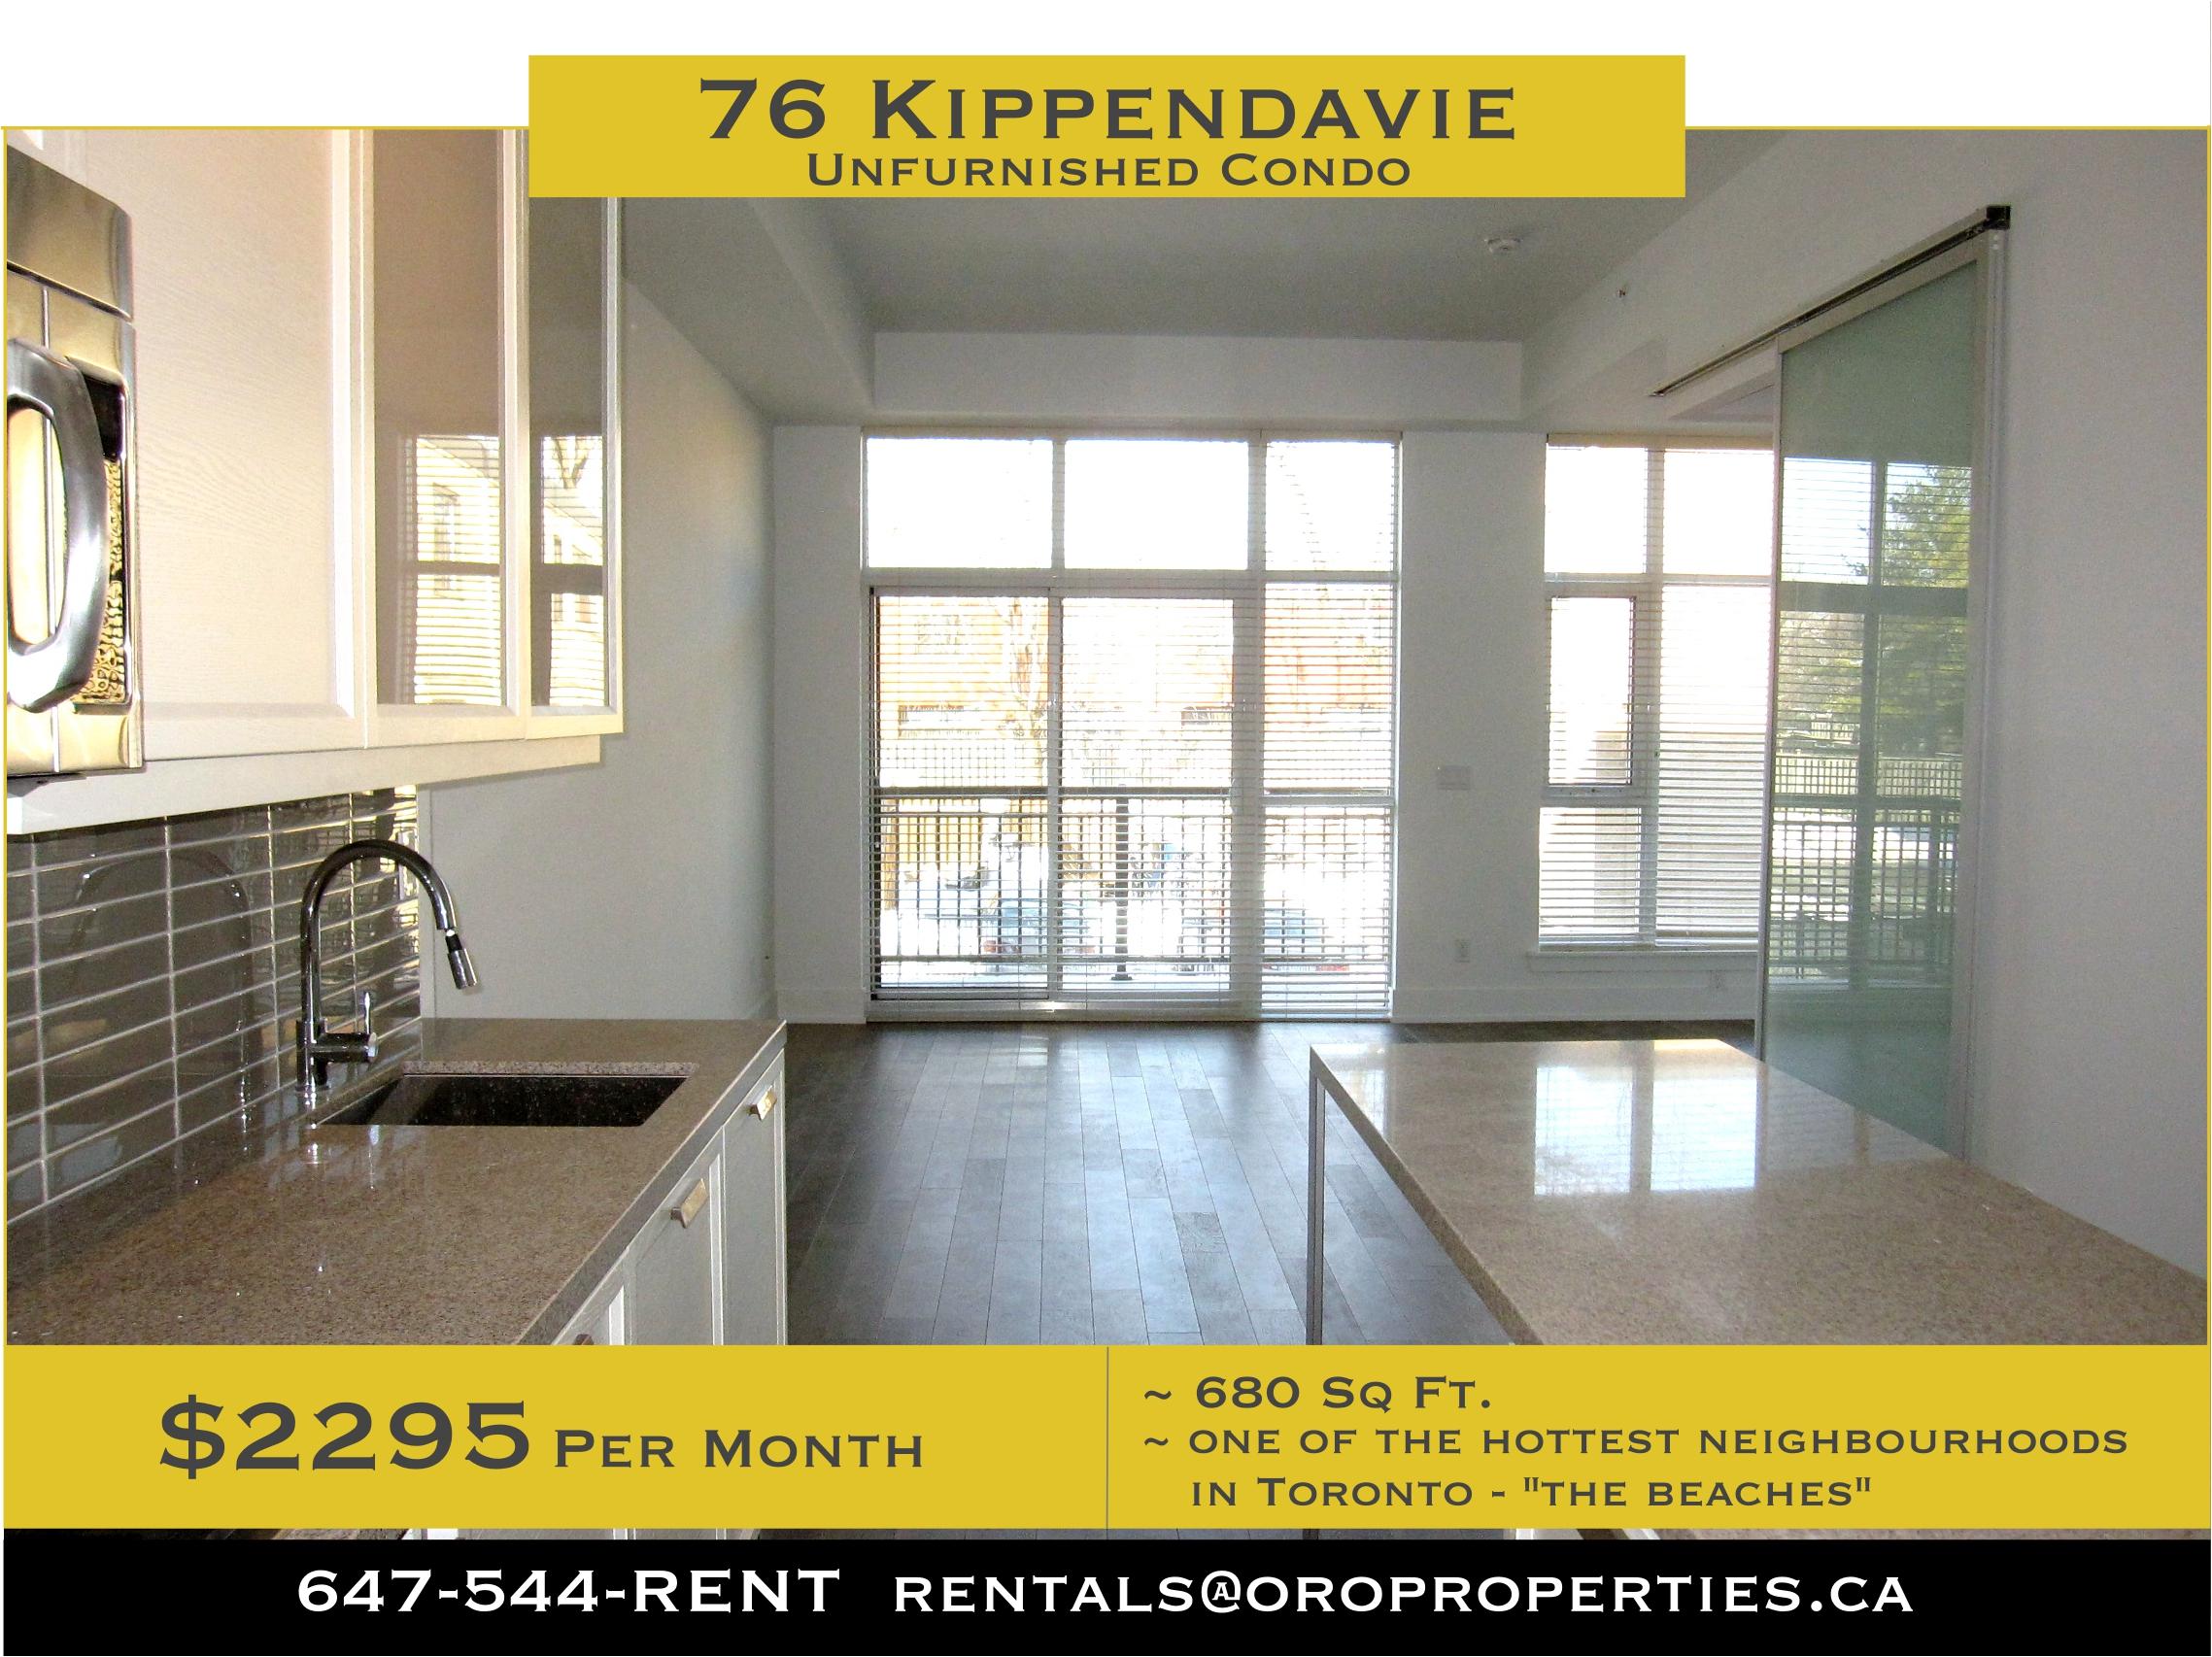 76 Kippendavie – Gorgeous 1 Bedroom + Den, 1 Bathroom Condo in the Beaches!